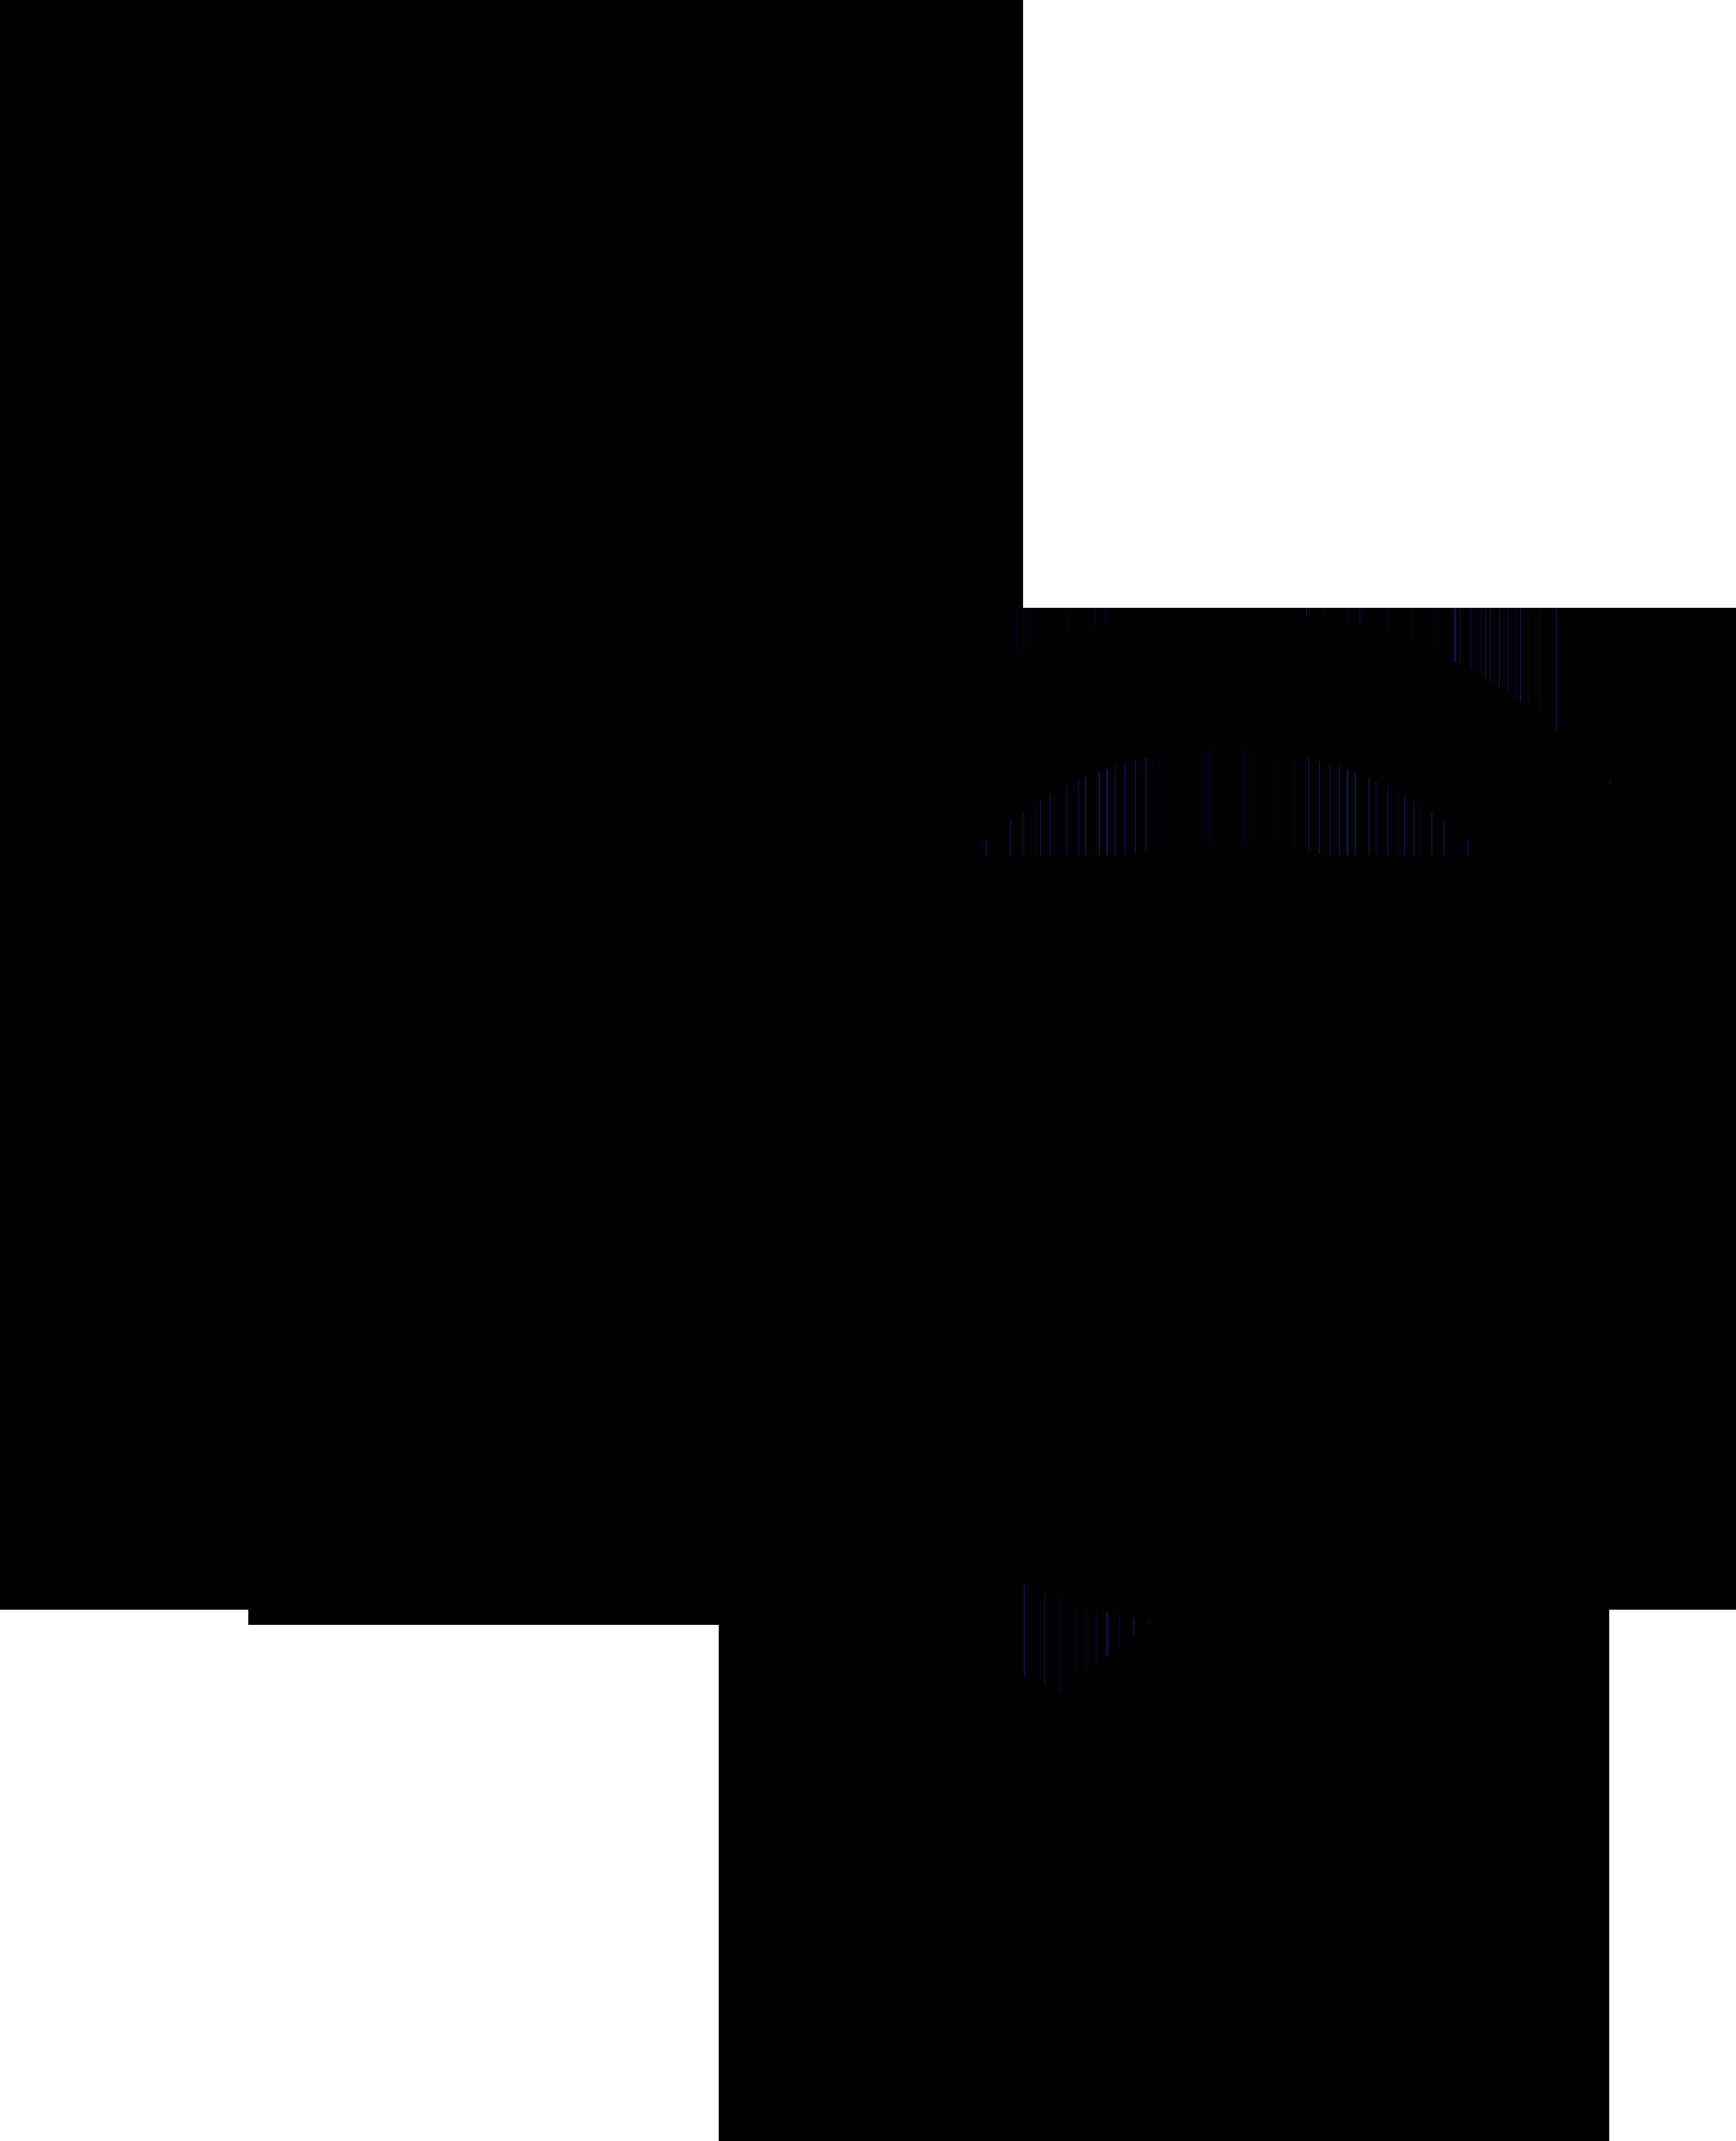 Nonbinary symbol interlocked with a nonbinary woman symbol.